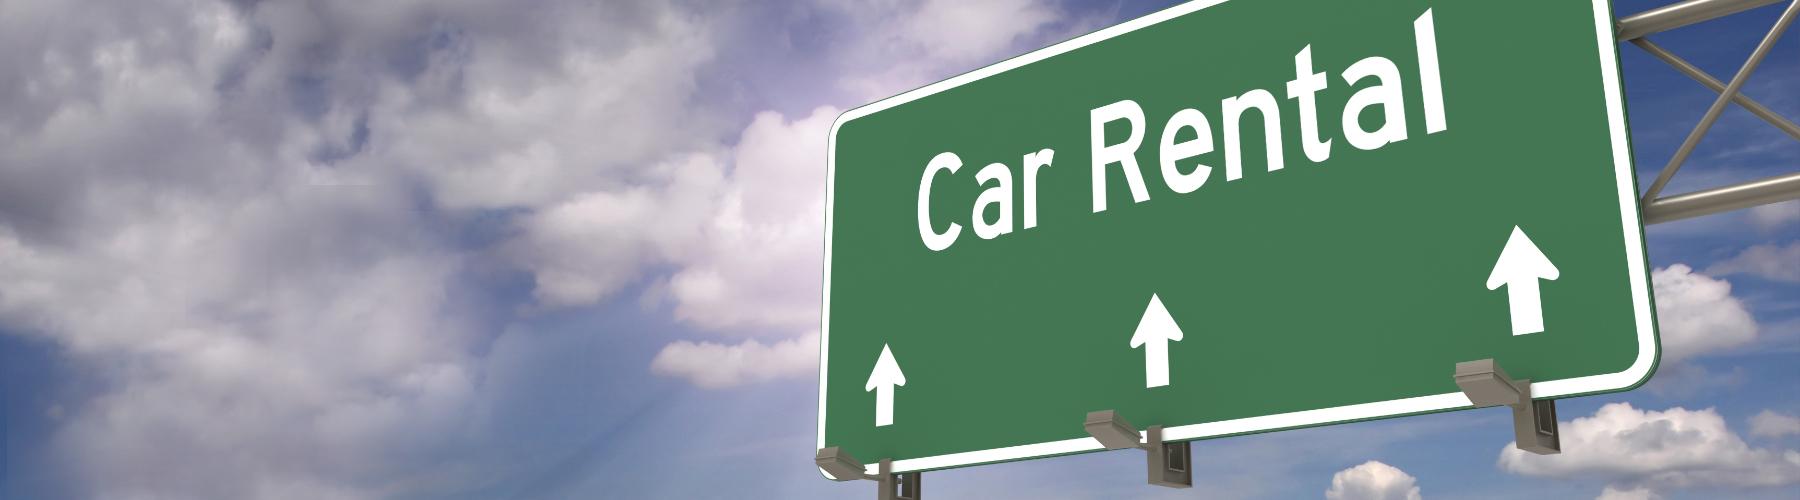 car rental direction signal hording